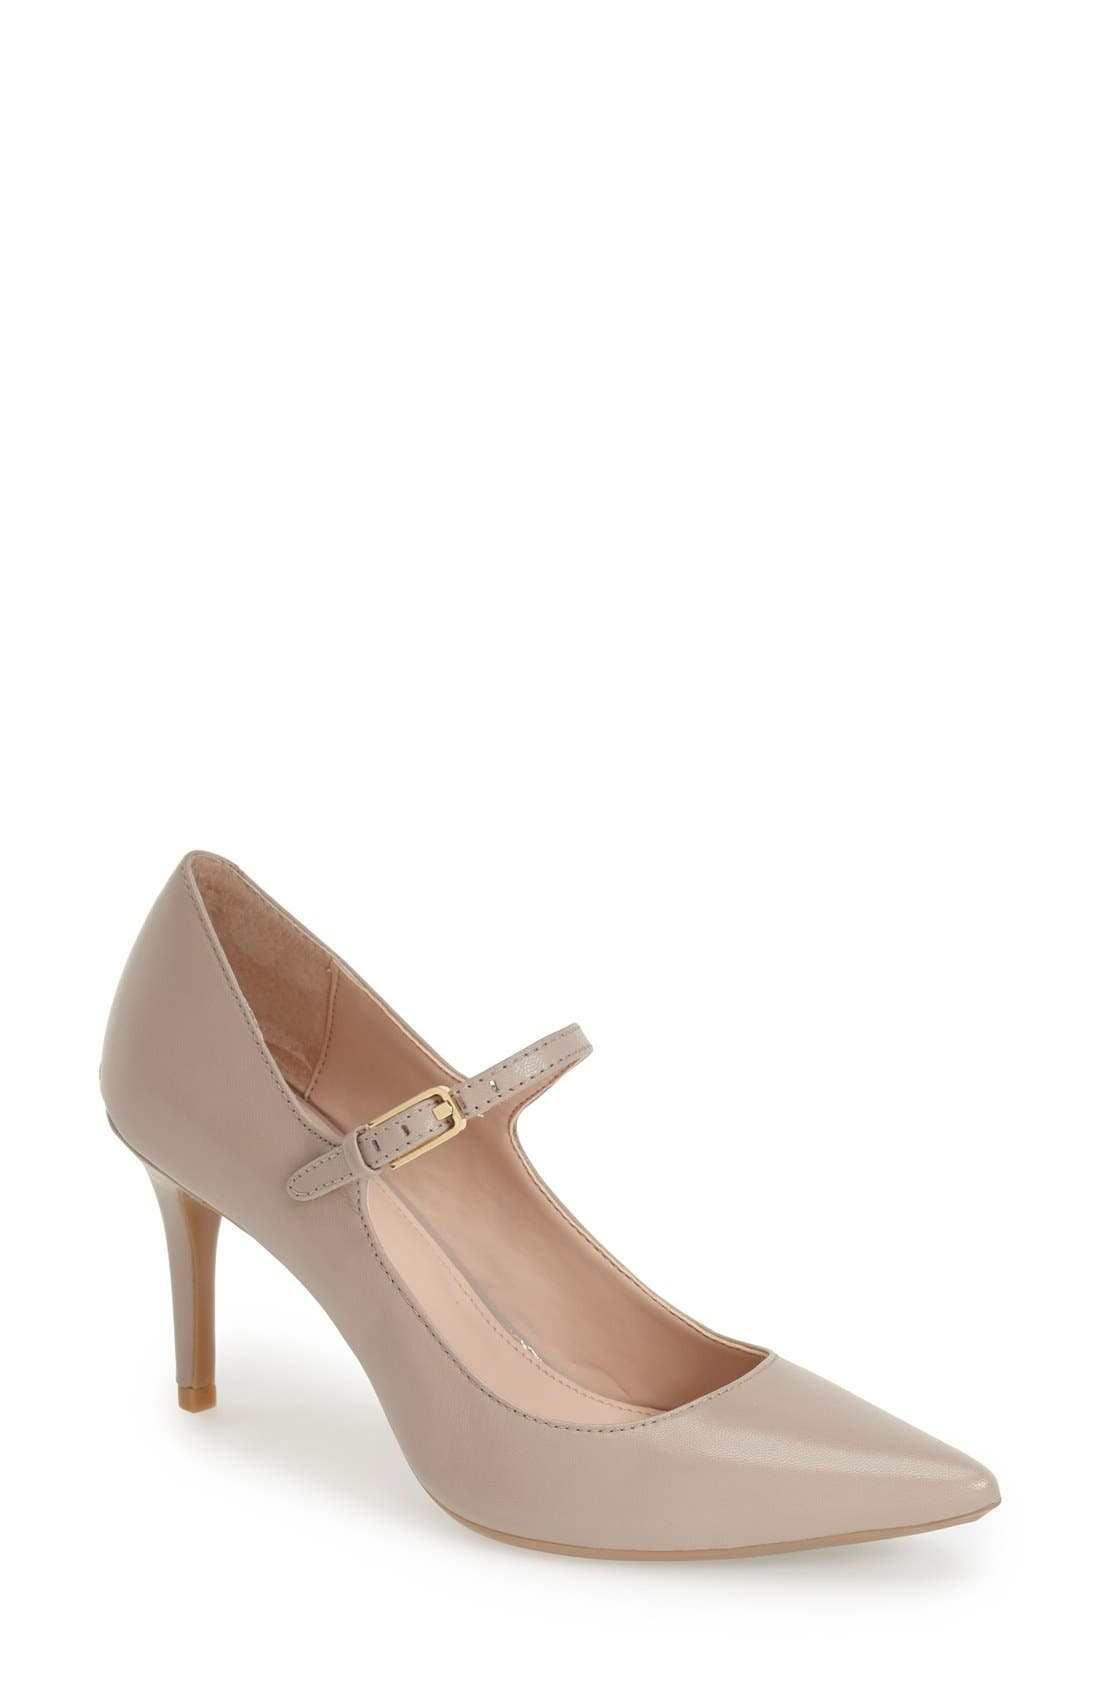 Main Image - Calvin Klein 'Genavee' Pointy Toe Pump (Women)